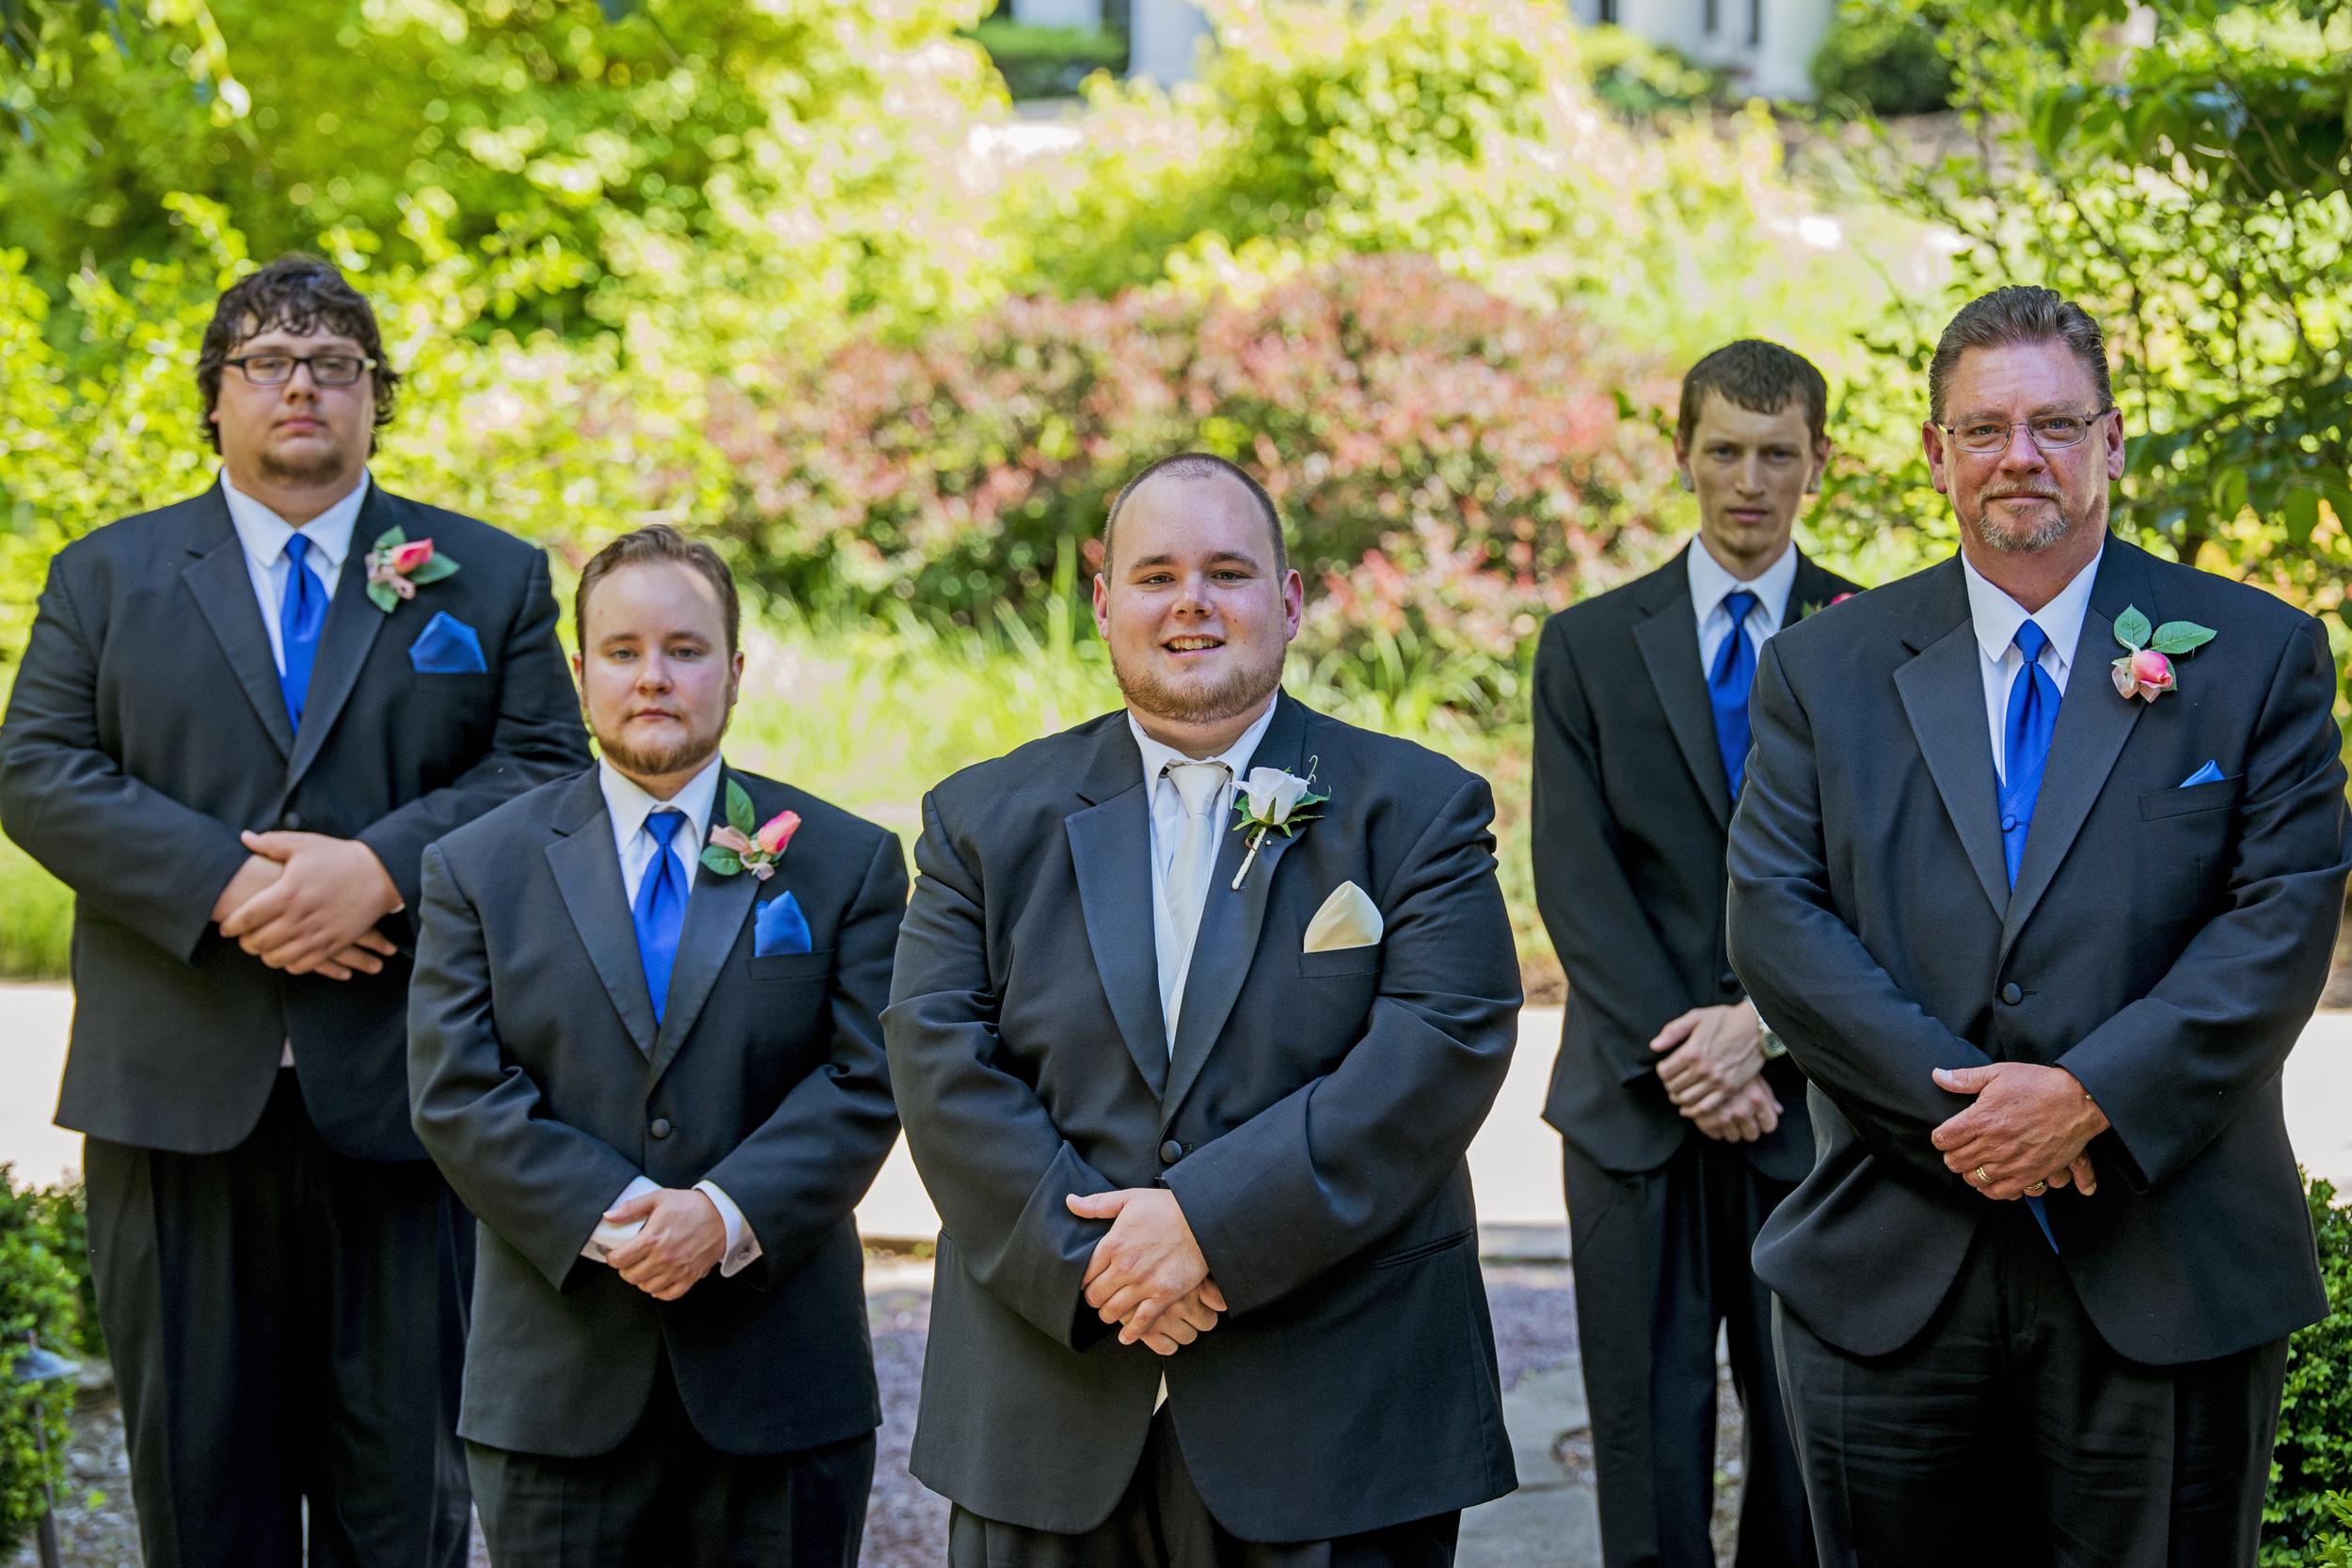 mount_vernon_summer_wedding_lynchburg_va008.jpg